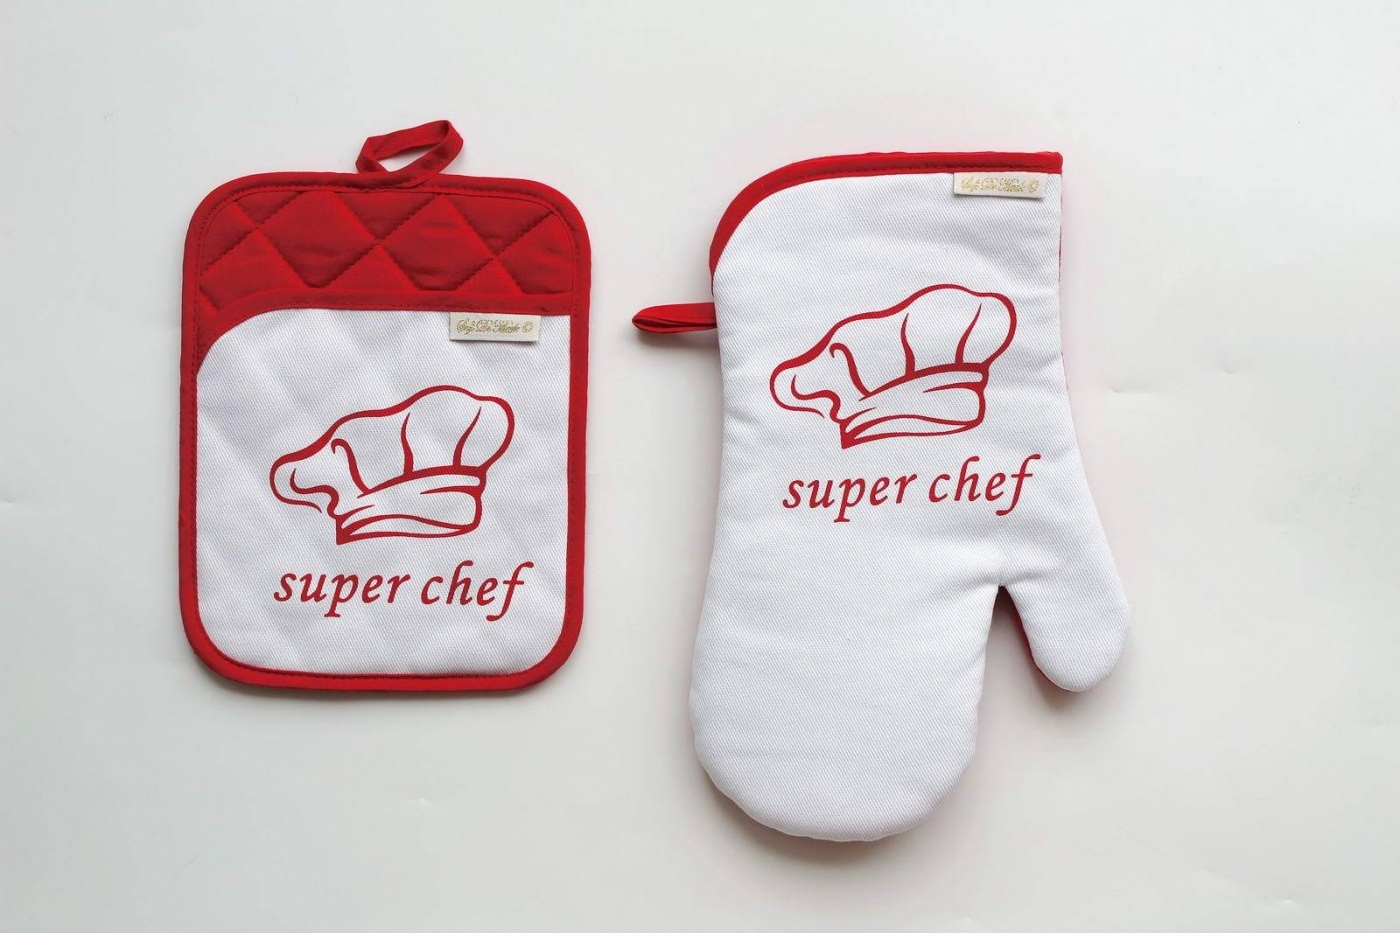 Кухонный набор Jerred Цвет: Красный